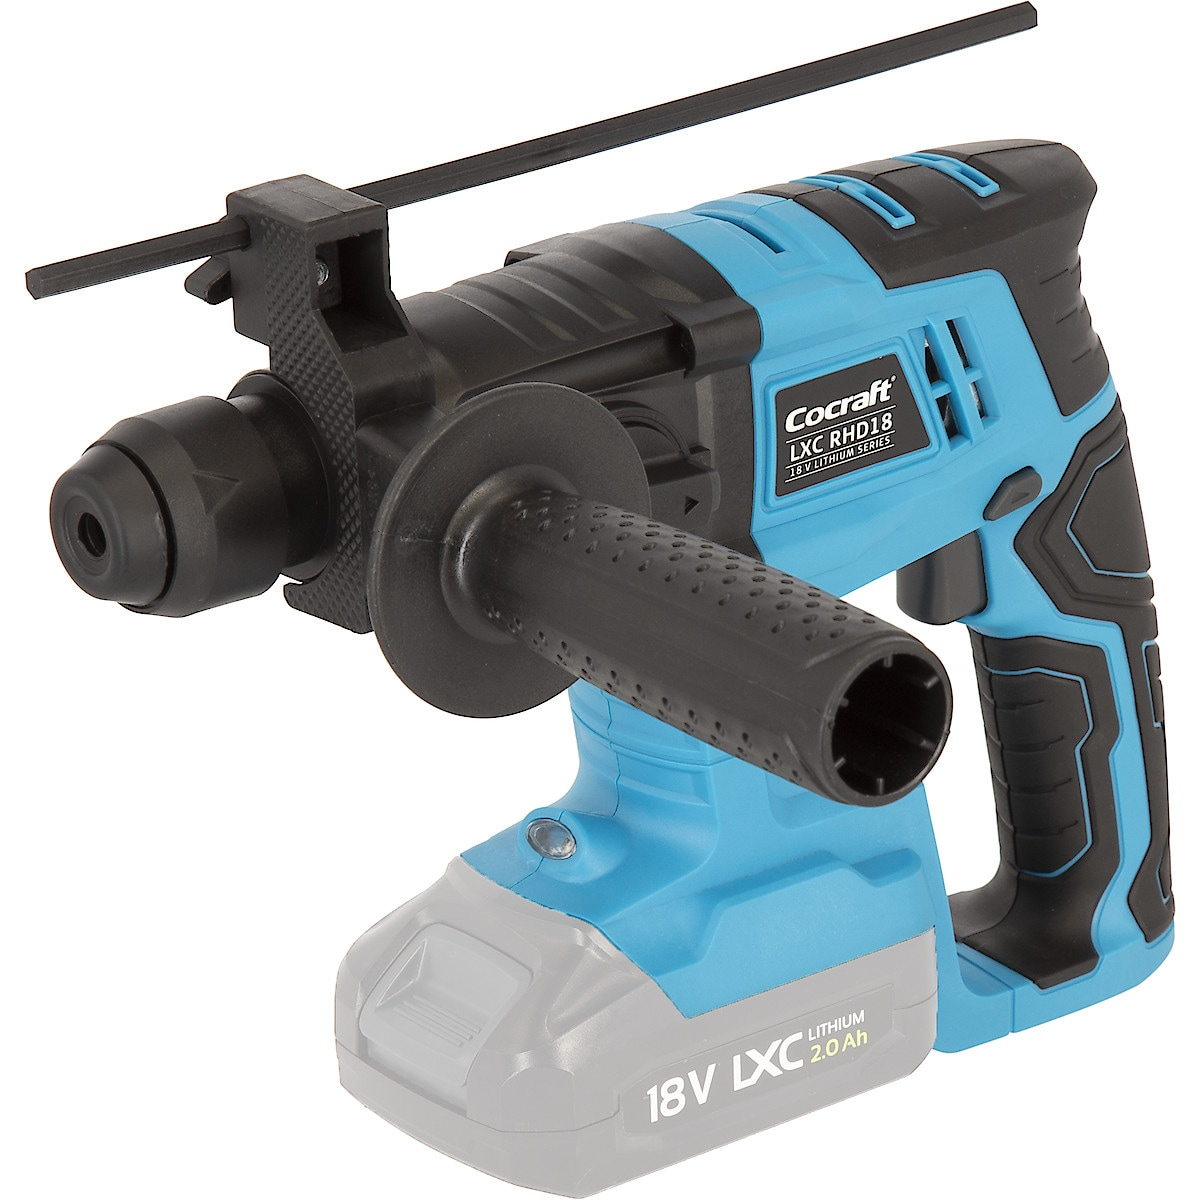 Cocraft LXC RHD18 borhammer